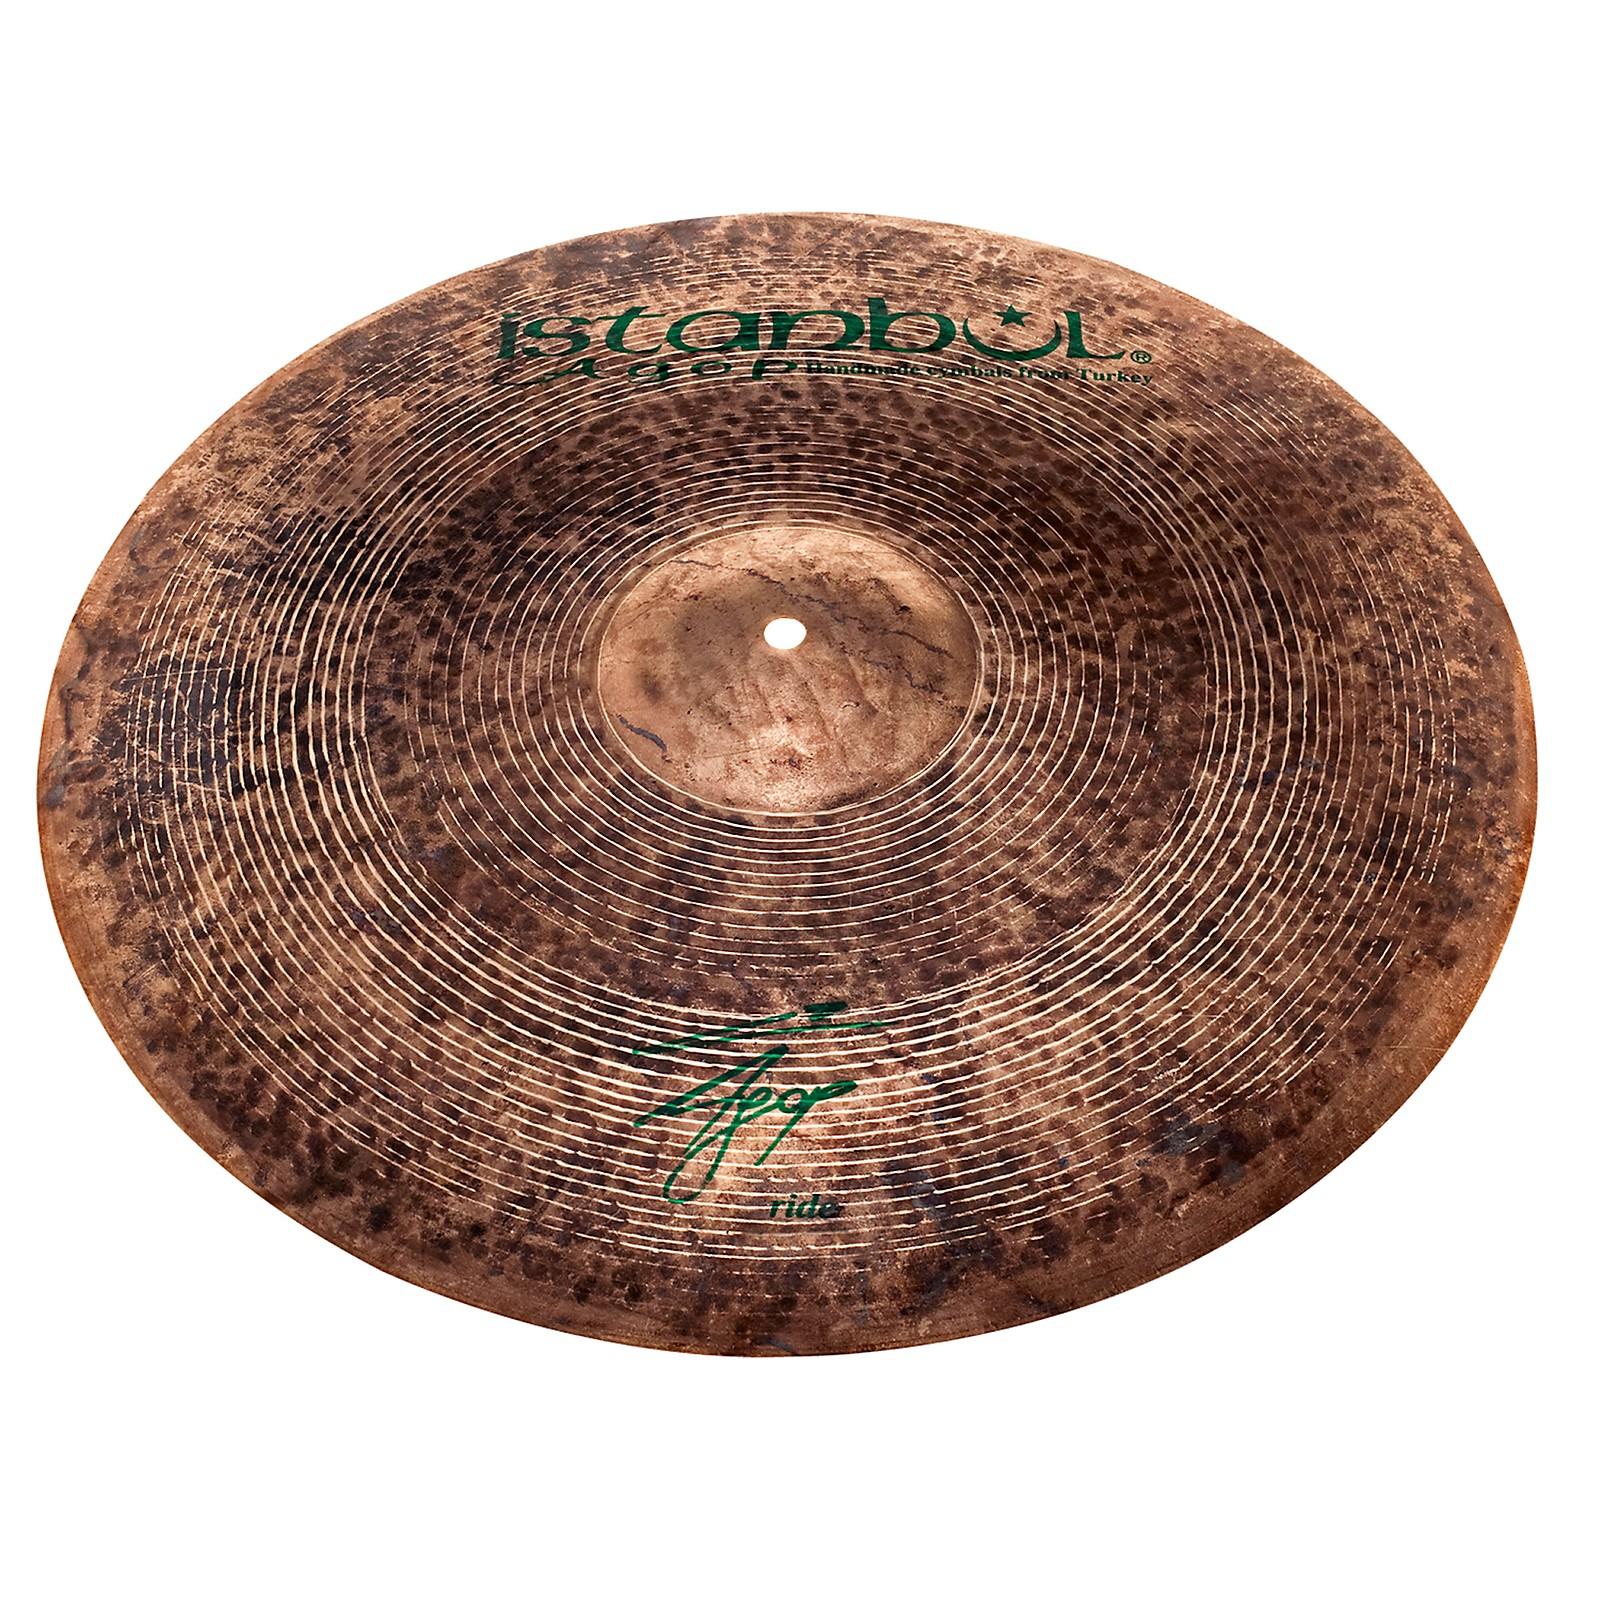 Istanbul Agop Signature Ride Cymbal